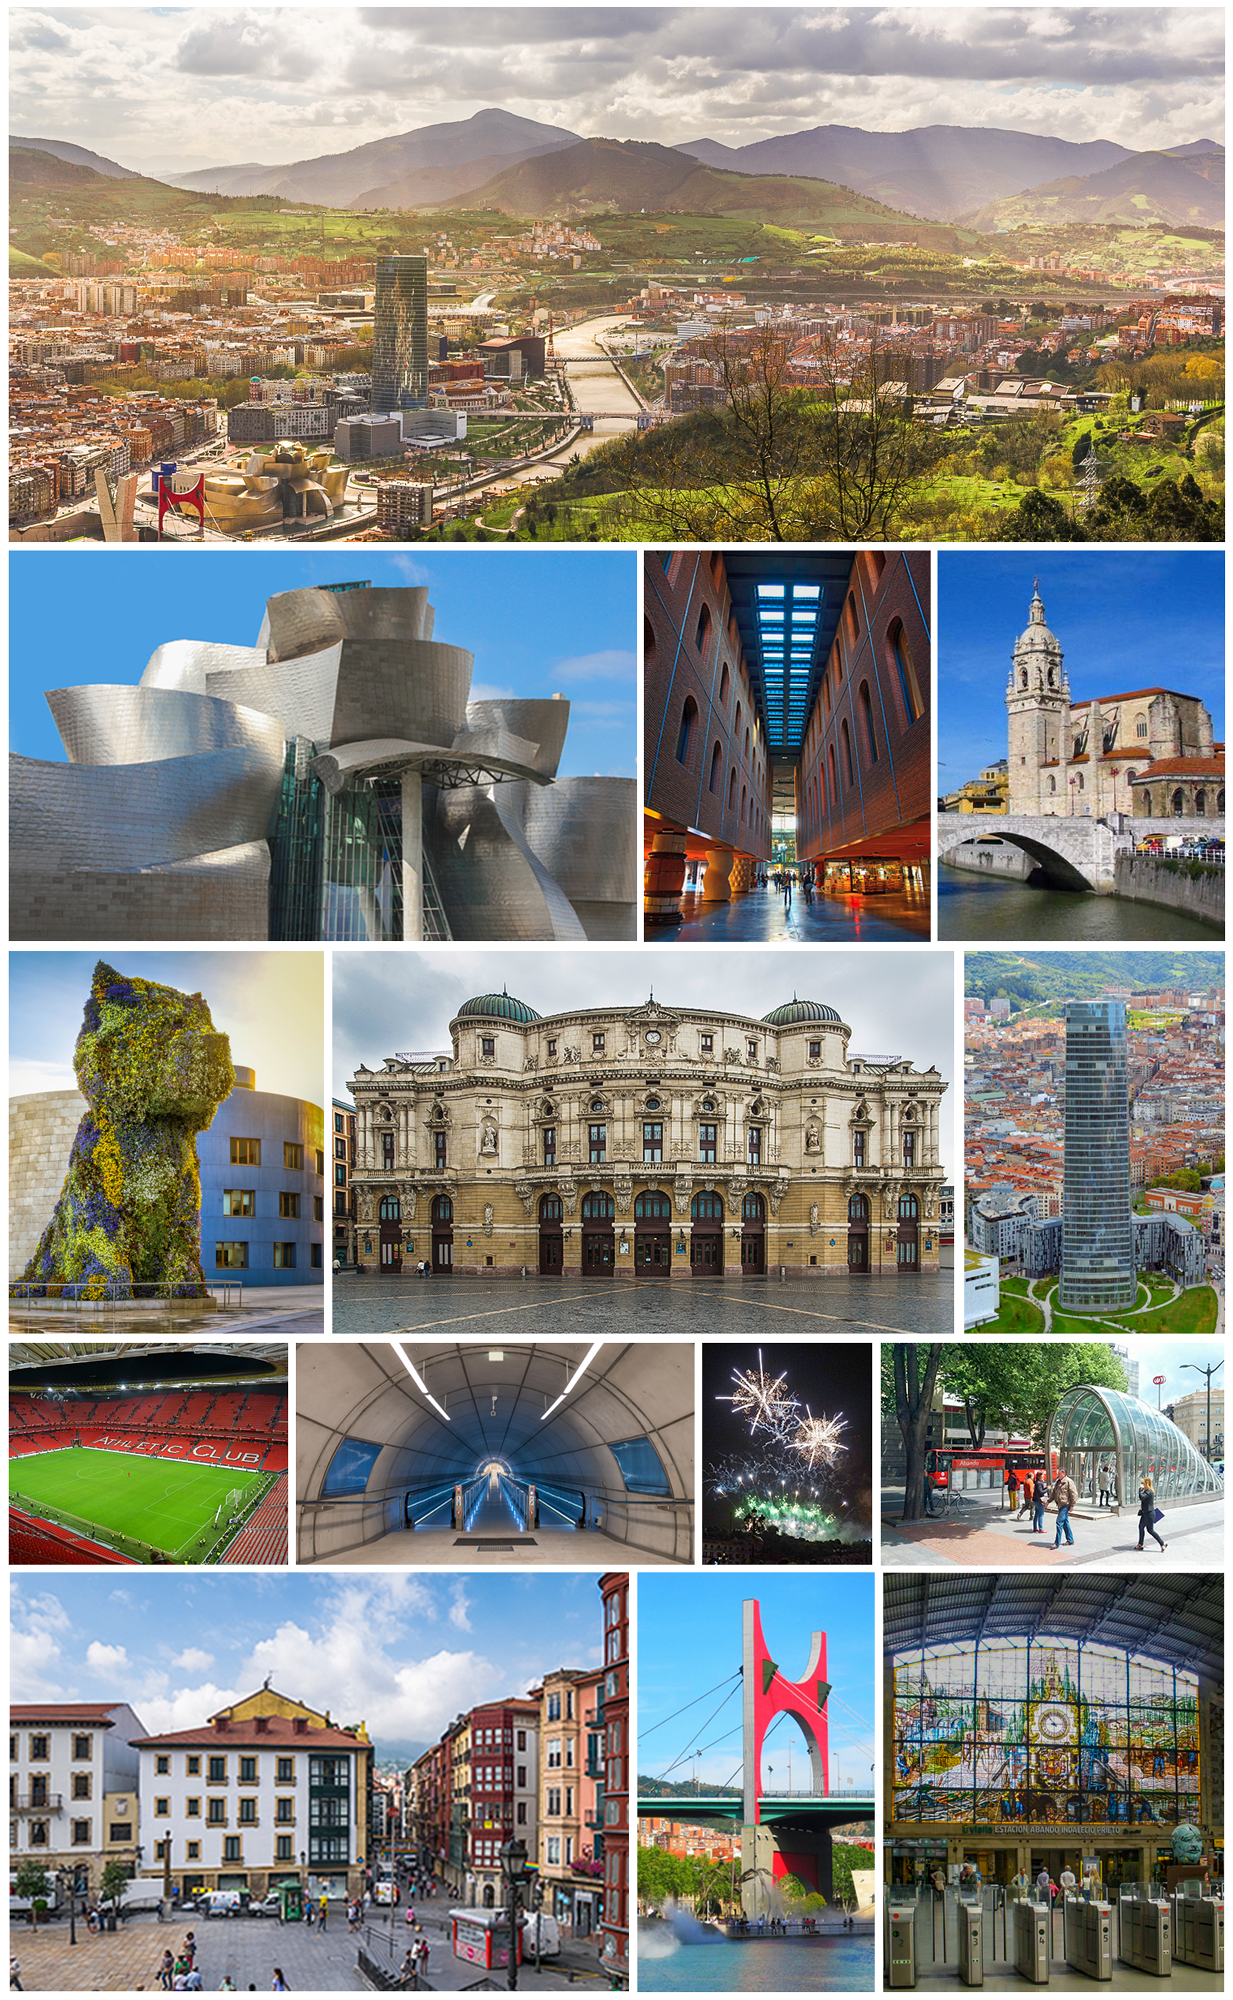 Bilbao - Wikipedia